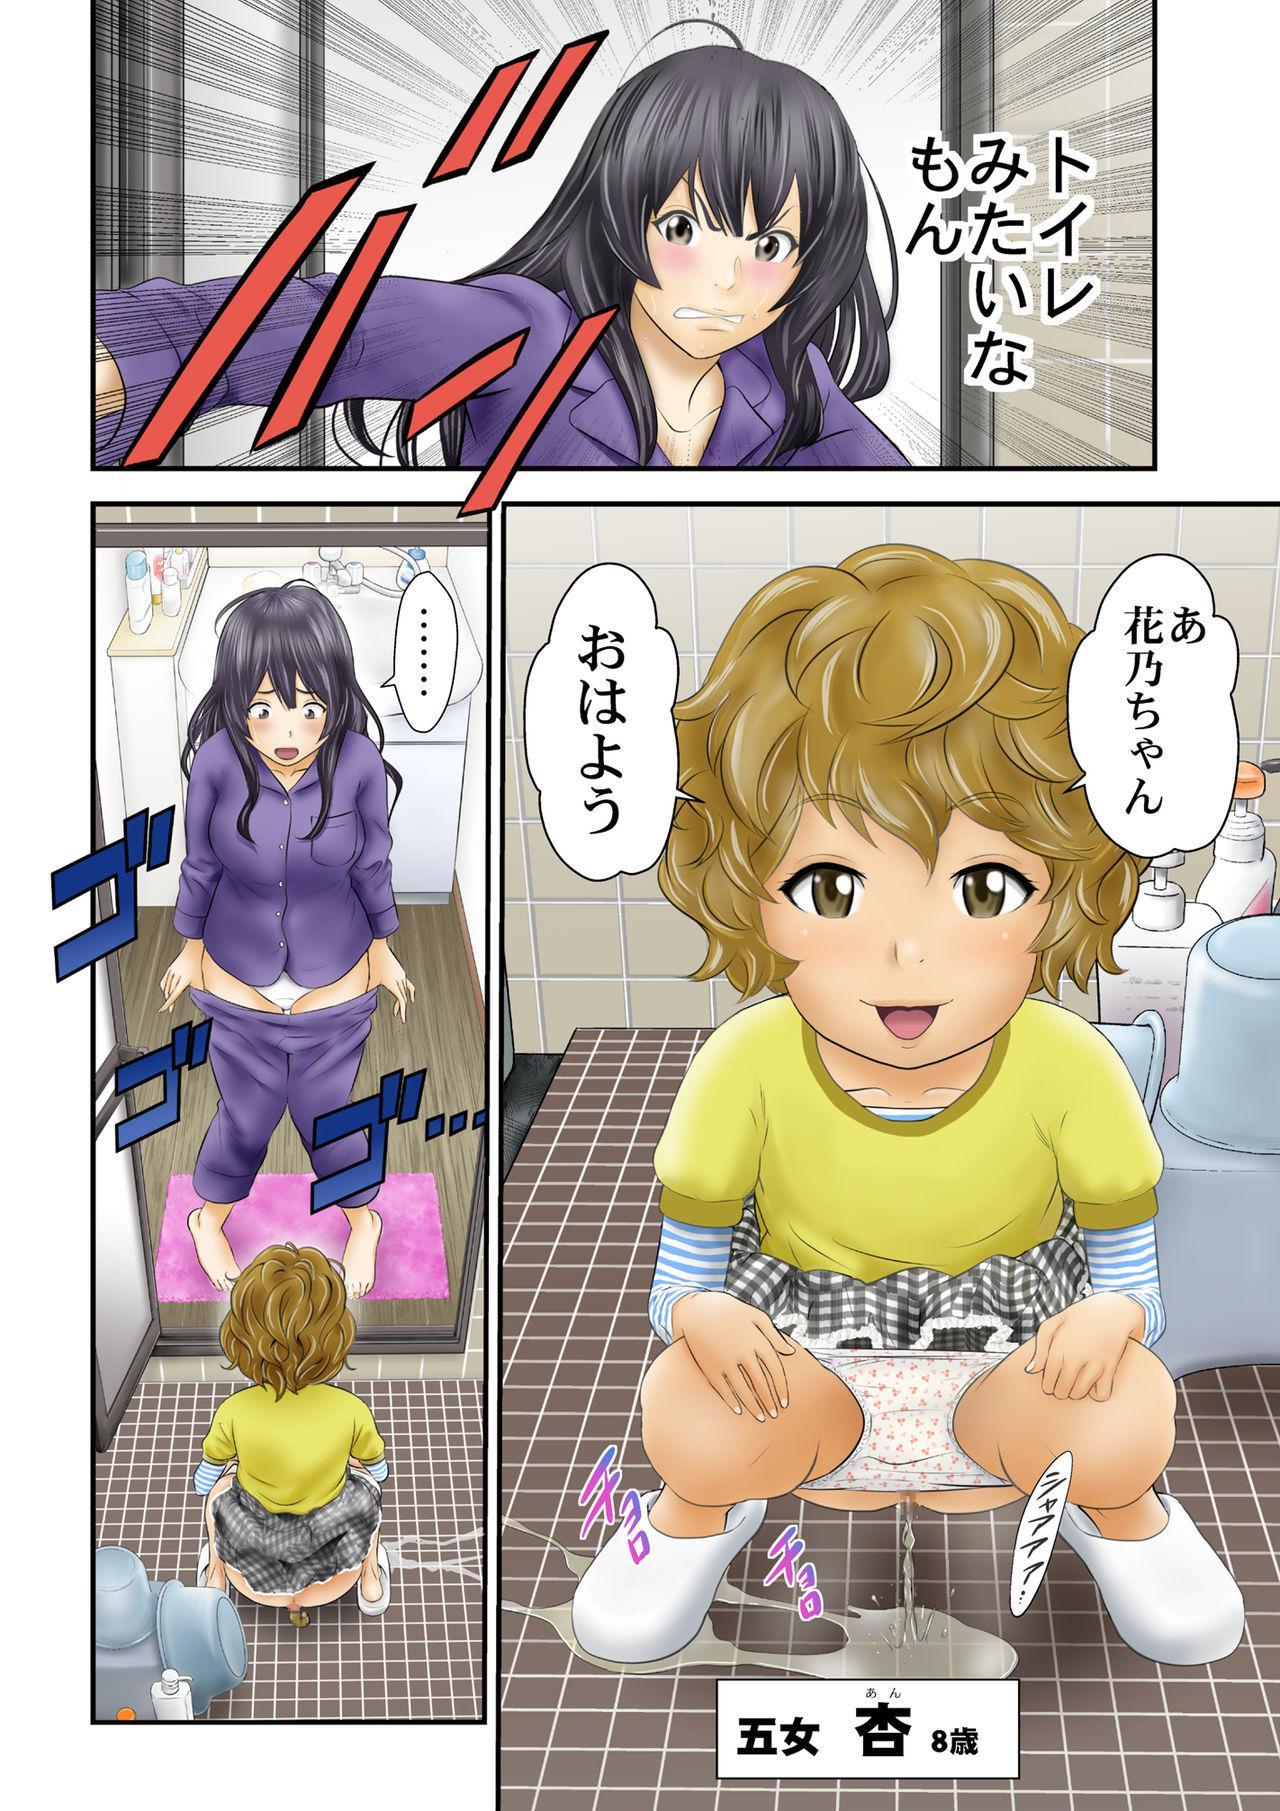 [GOLD DUST (Tange Suzuki)] Ichigotani-ka no Onna-tachi - ICHIGOTANI family girls [Digital] 5